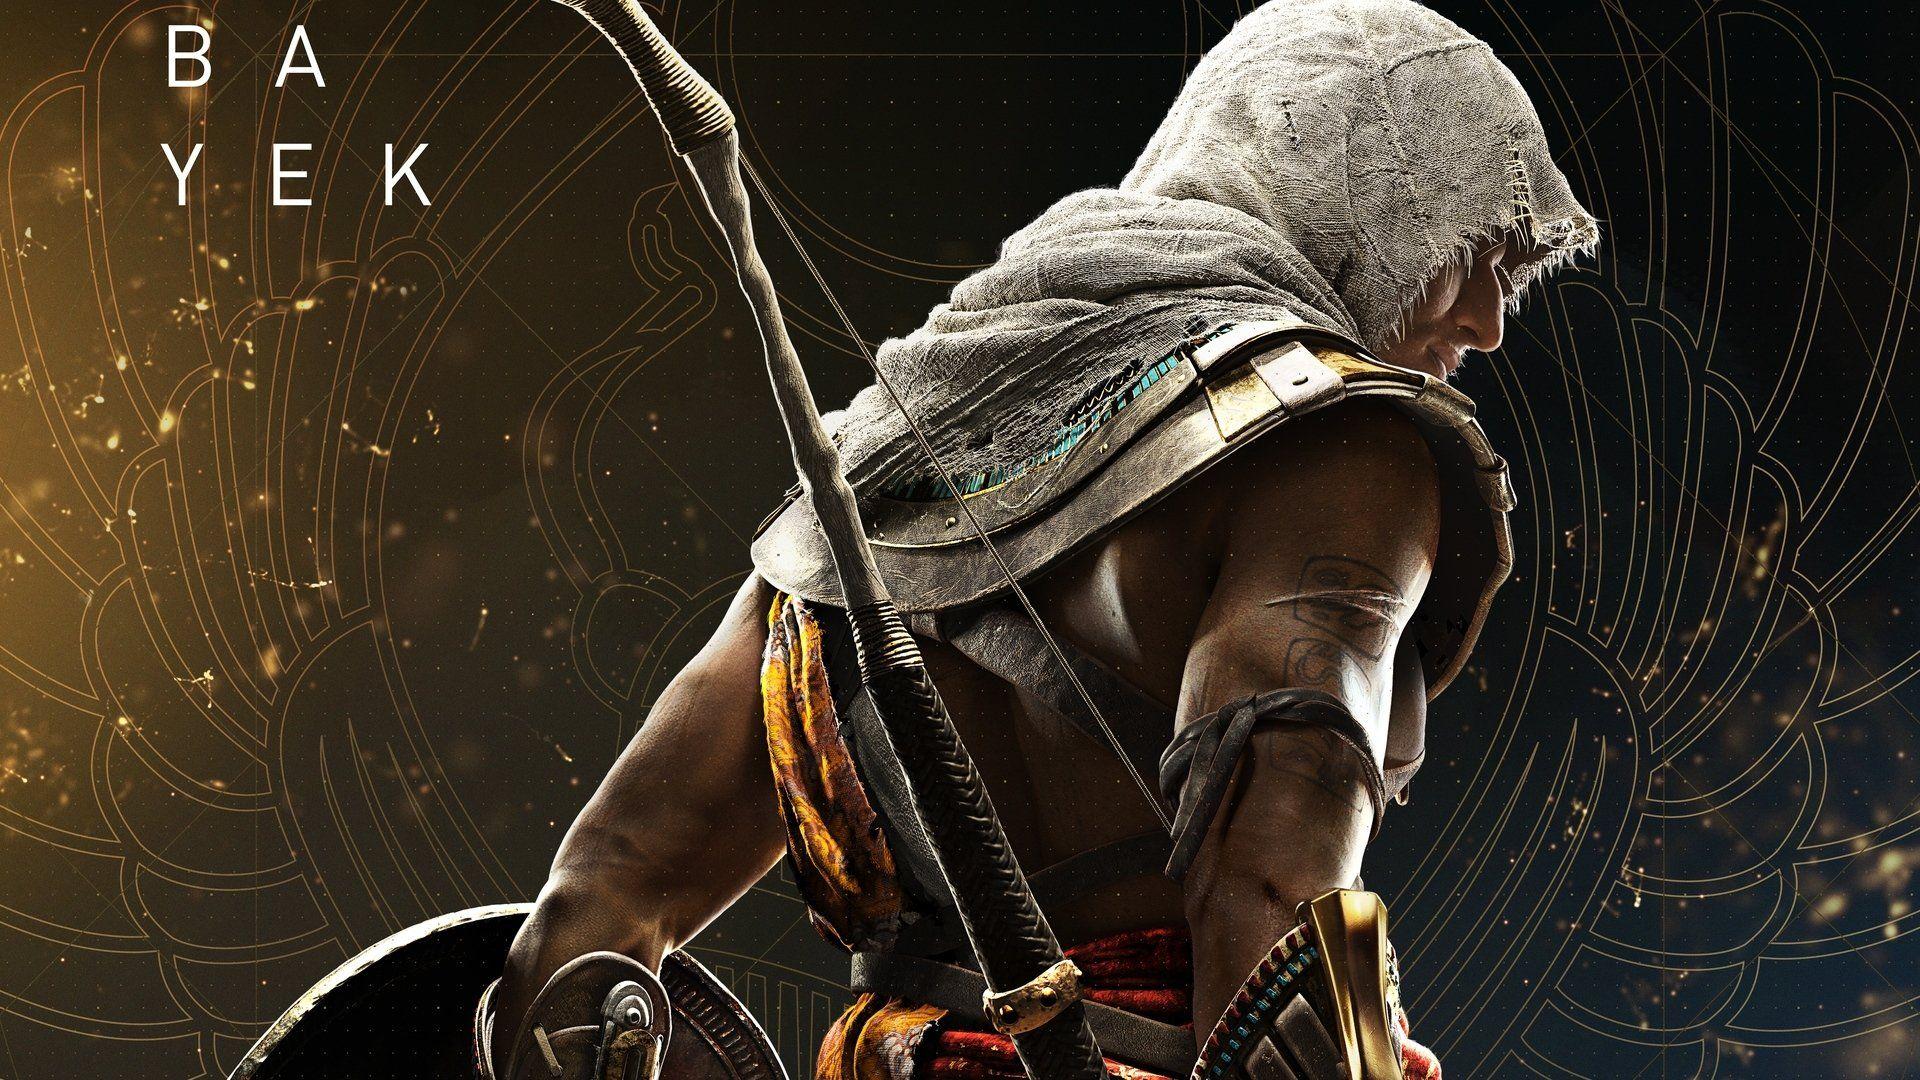 Popular Wallpaper Horse Assassin'S Creed - 2e209348977dc7c9df23d67723198f16  Picture_959661.jpg